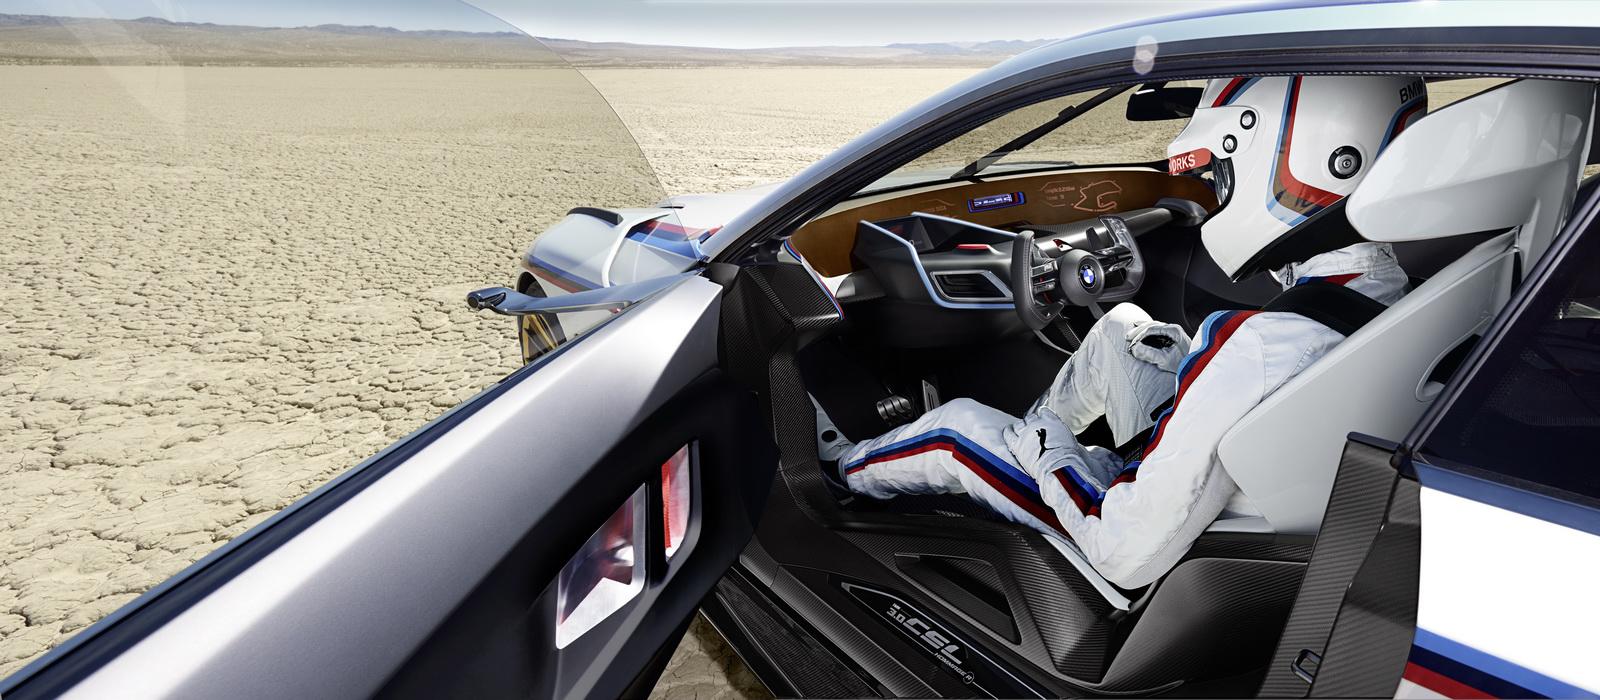 BMW-30-Hommage-R-Concept-23